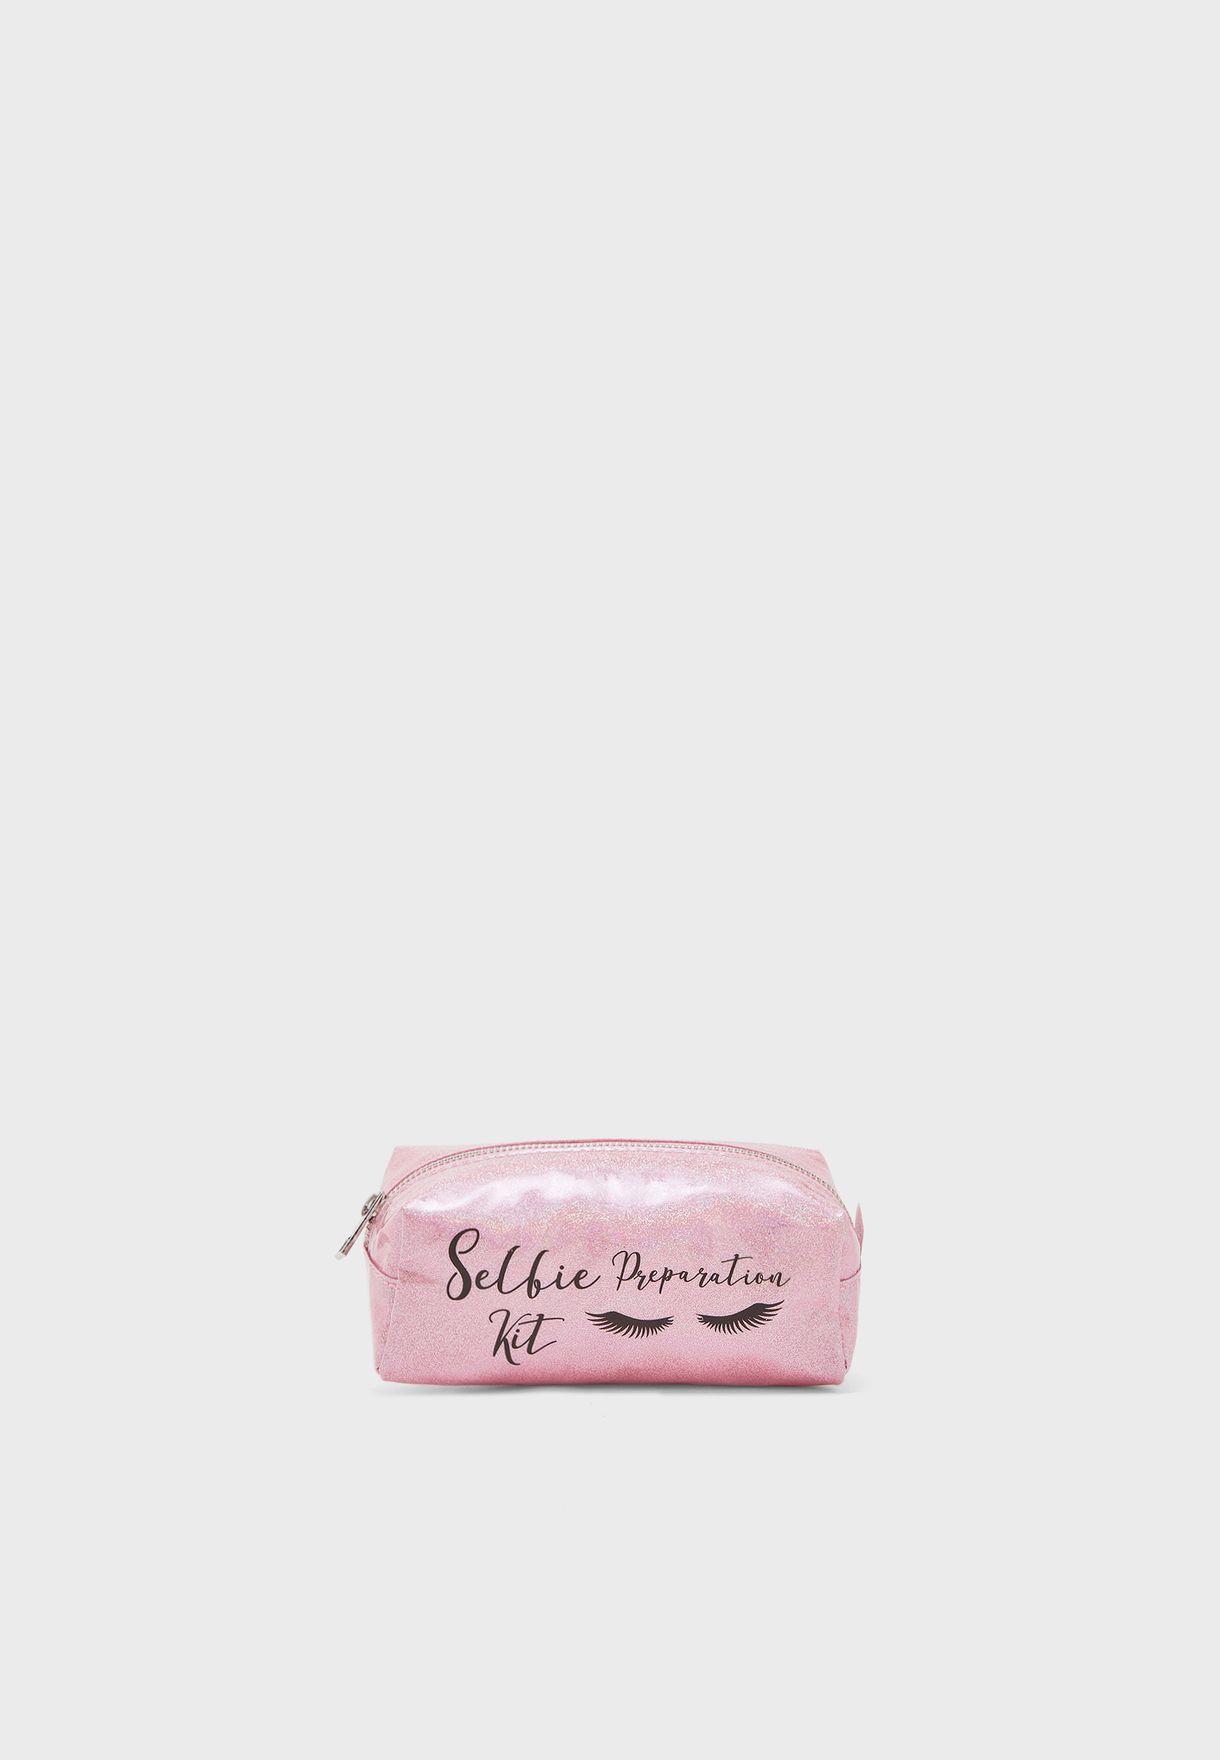 Selfie Preparation  Cosmetic Bag